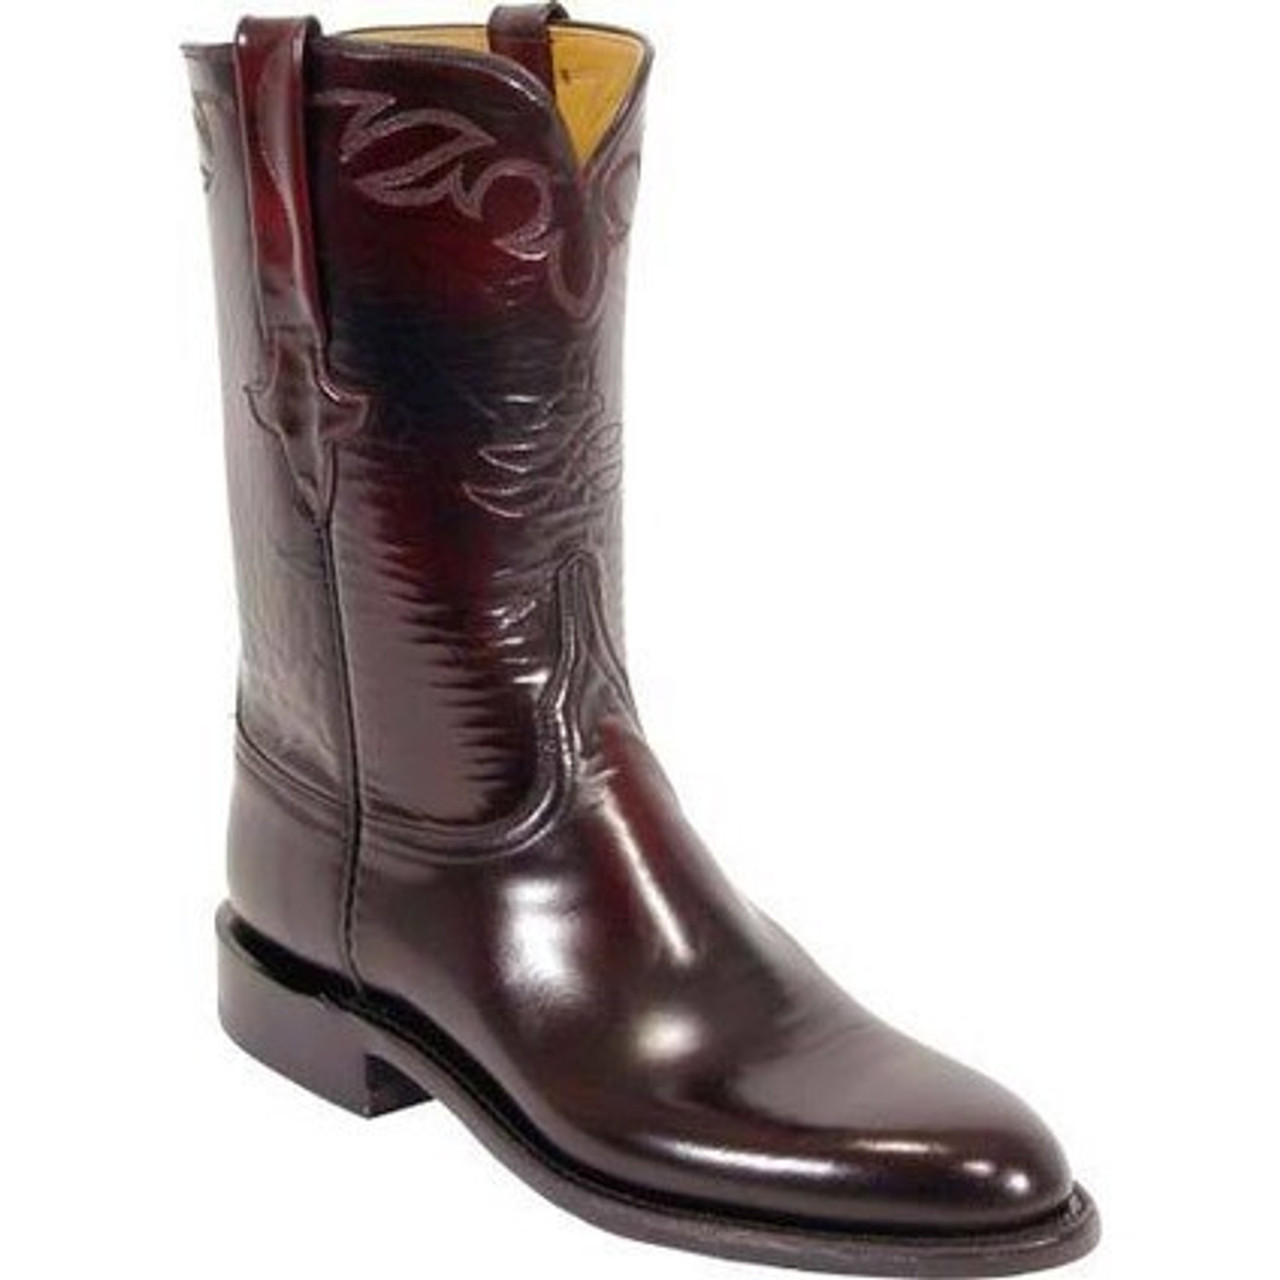 e08023c4413 Lucchese Men's Boots - Classics Hand Made - Black Cherry Brush Off - Goat